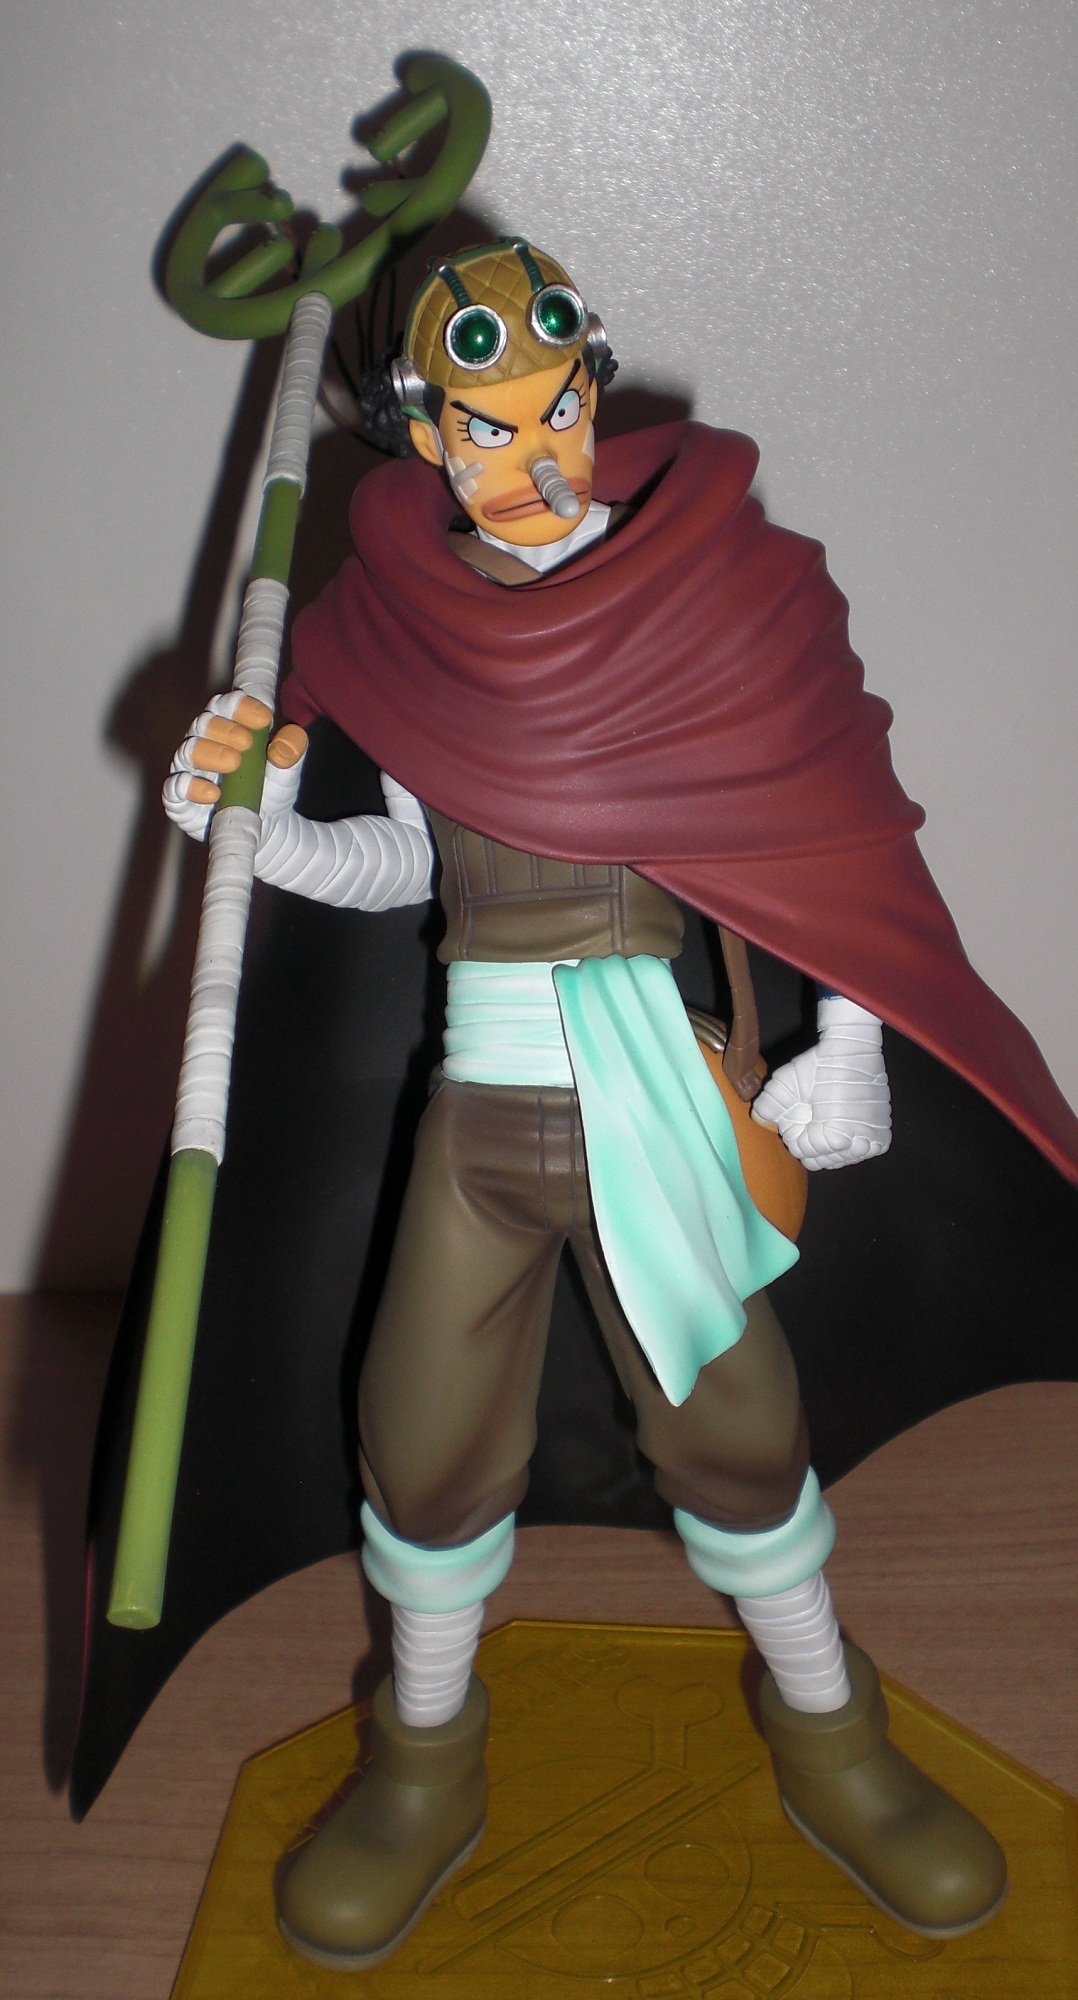 Portrait Of Pirates: Sogeking